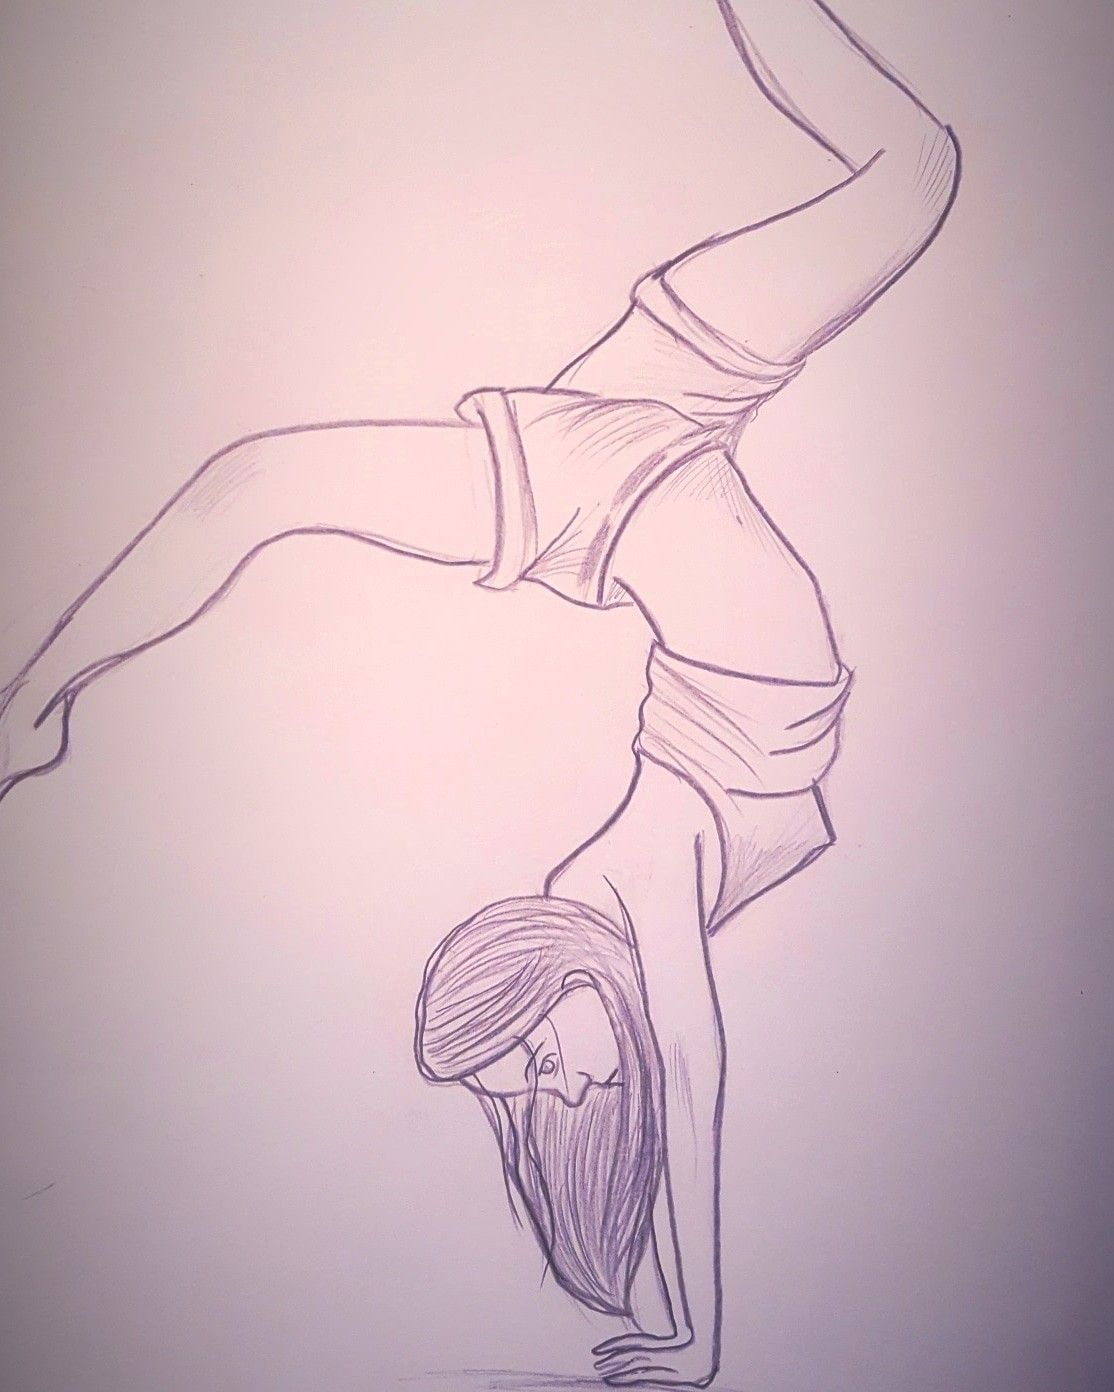 Drawing Art Drawings Sketches Simple Art Drawings Simple Cool Art Drawings